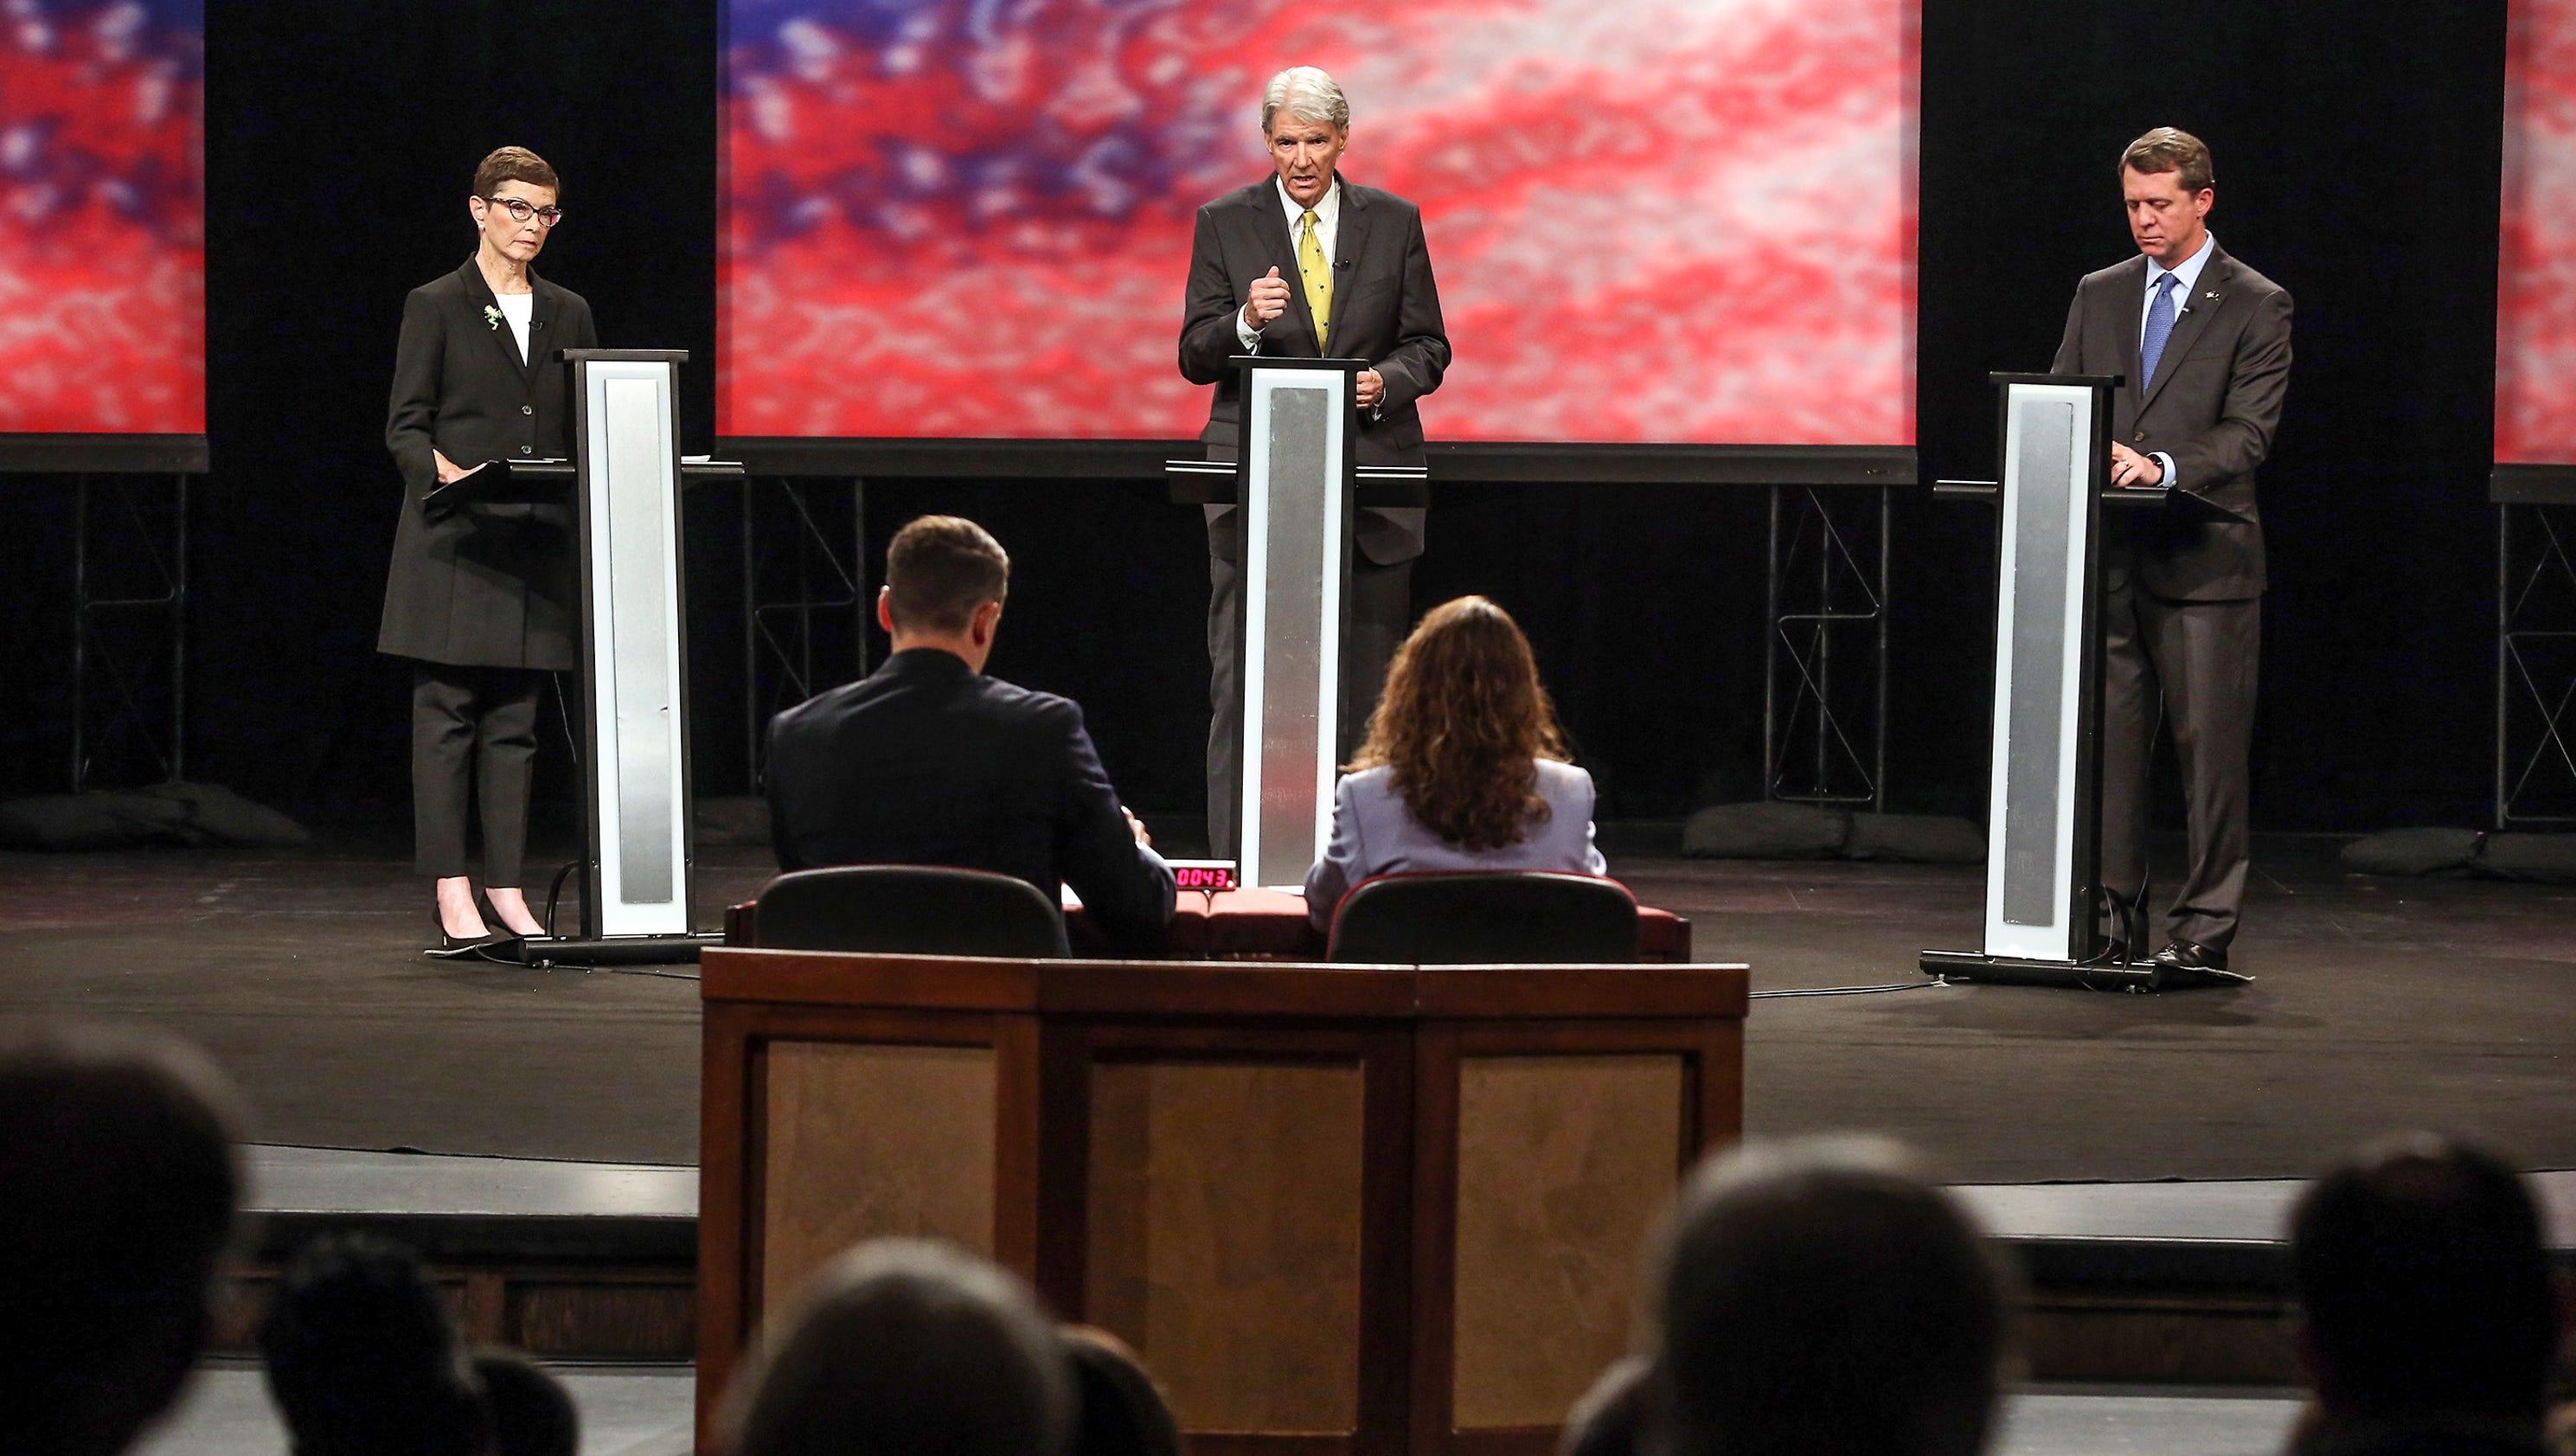 Democratic candidates for governor debate at Clemson